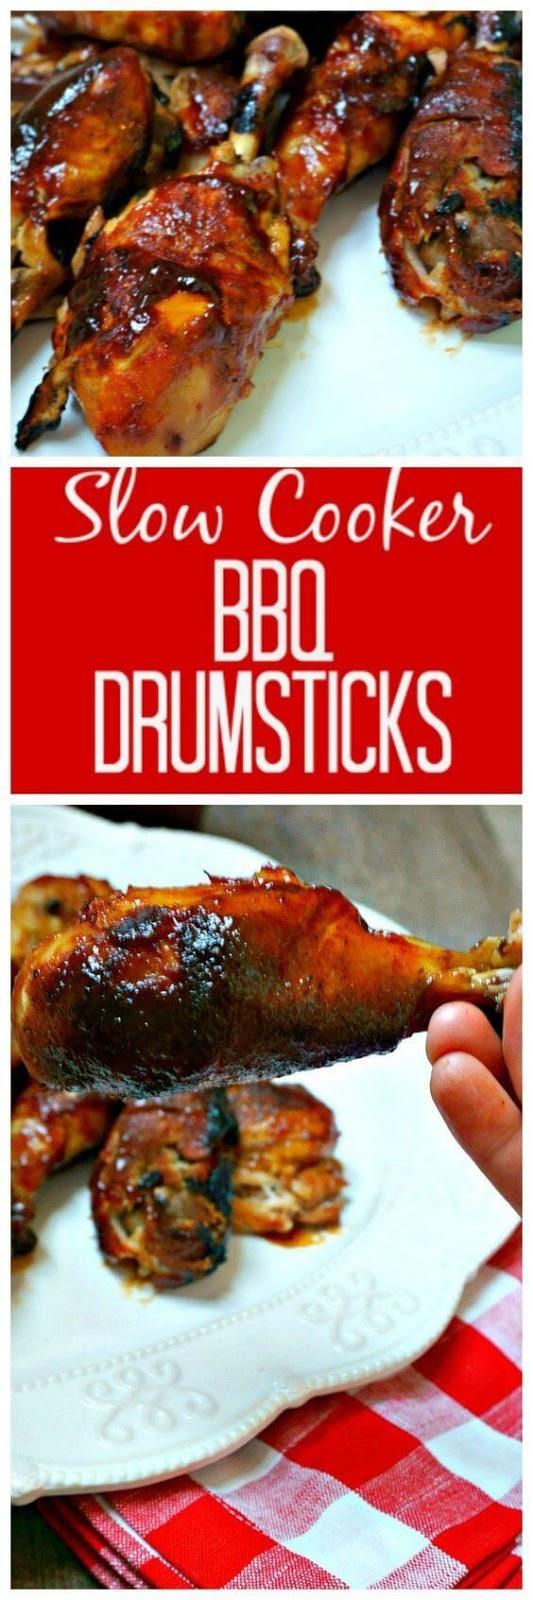 Easy Slow Cooker BBQ Drumsticks